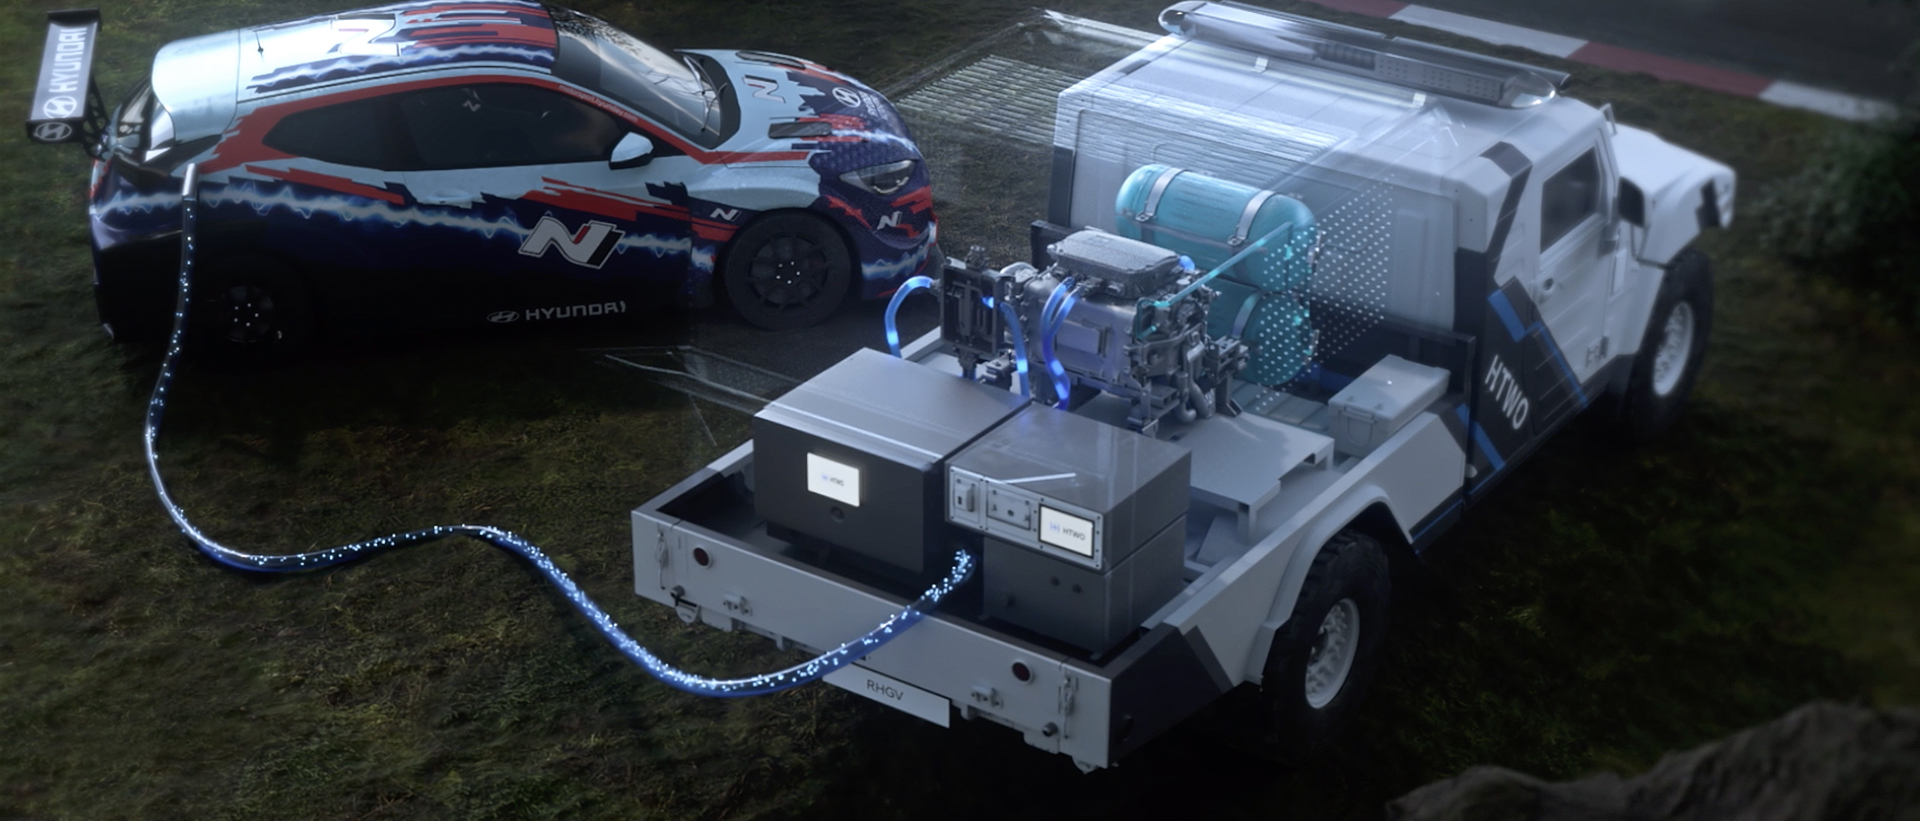 Hyundai hydrogen RHGV veloster n